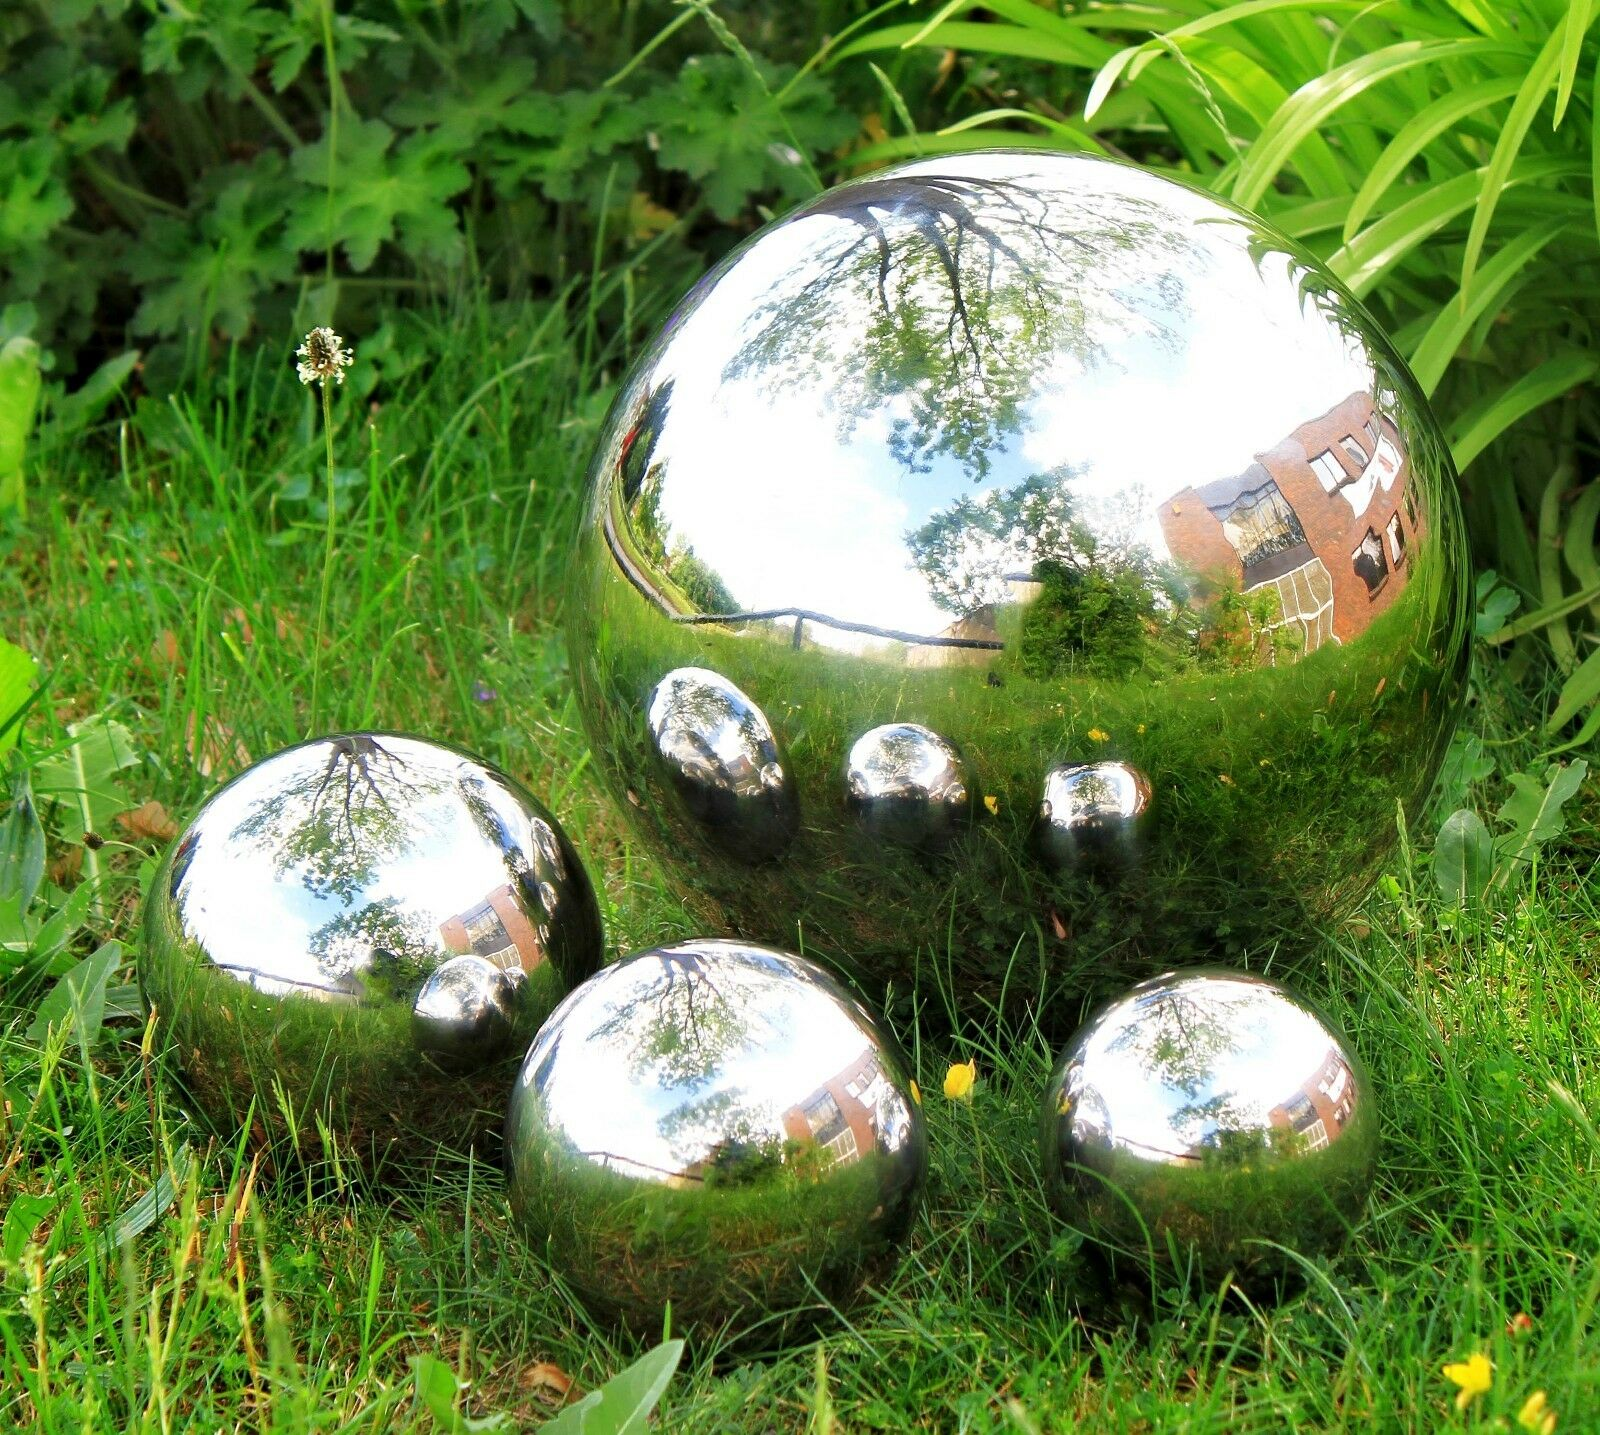 Garden Stainless Steel Gazing Balls Metal Ball Globes Floating Pond Decor Balls